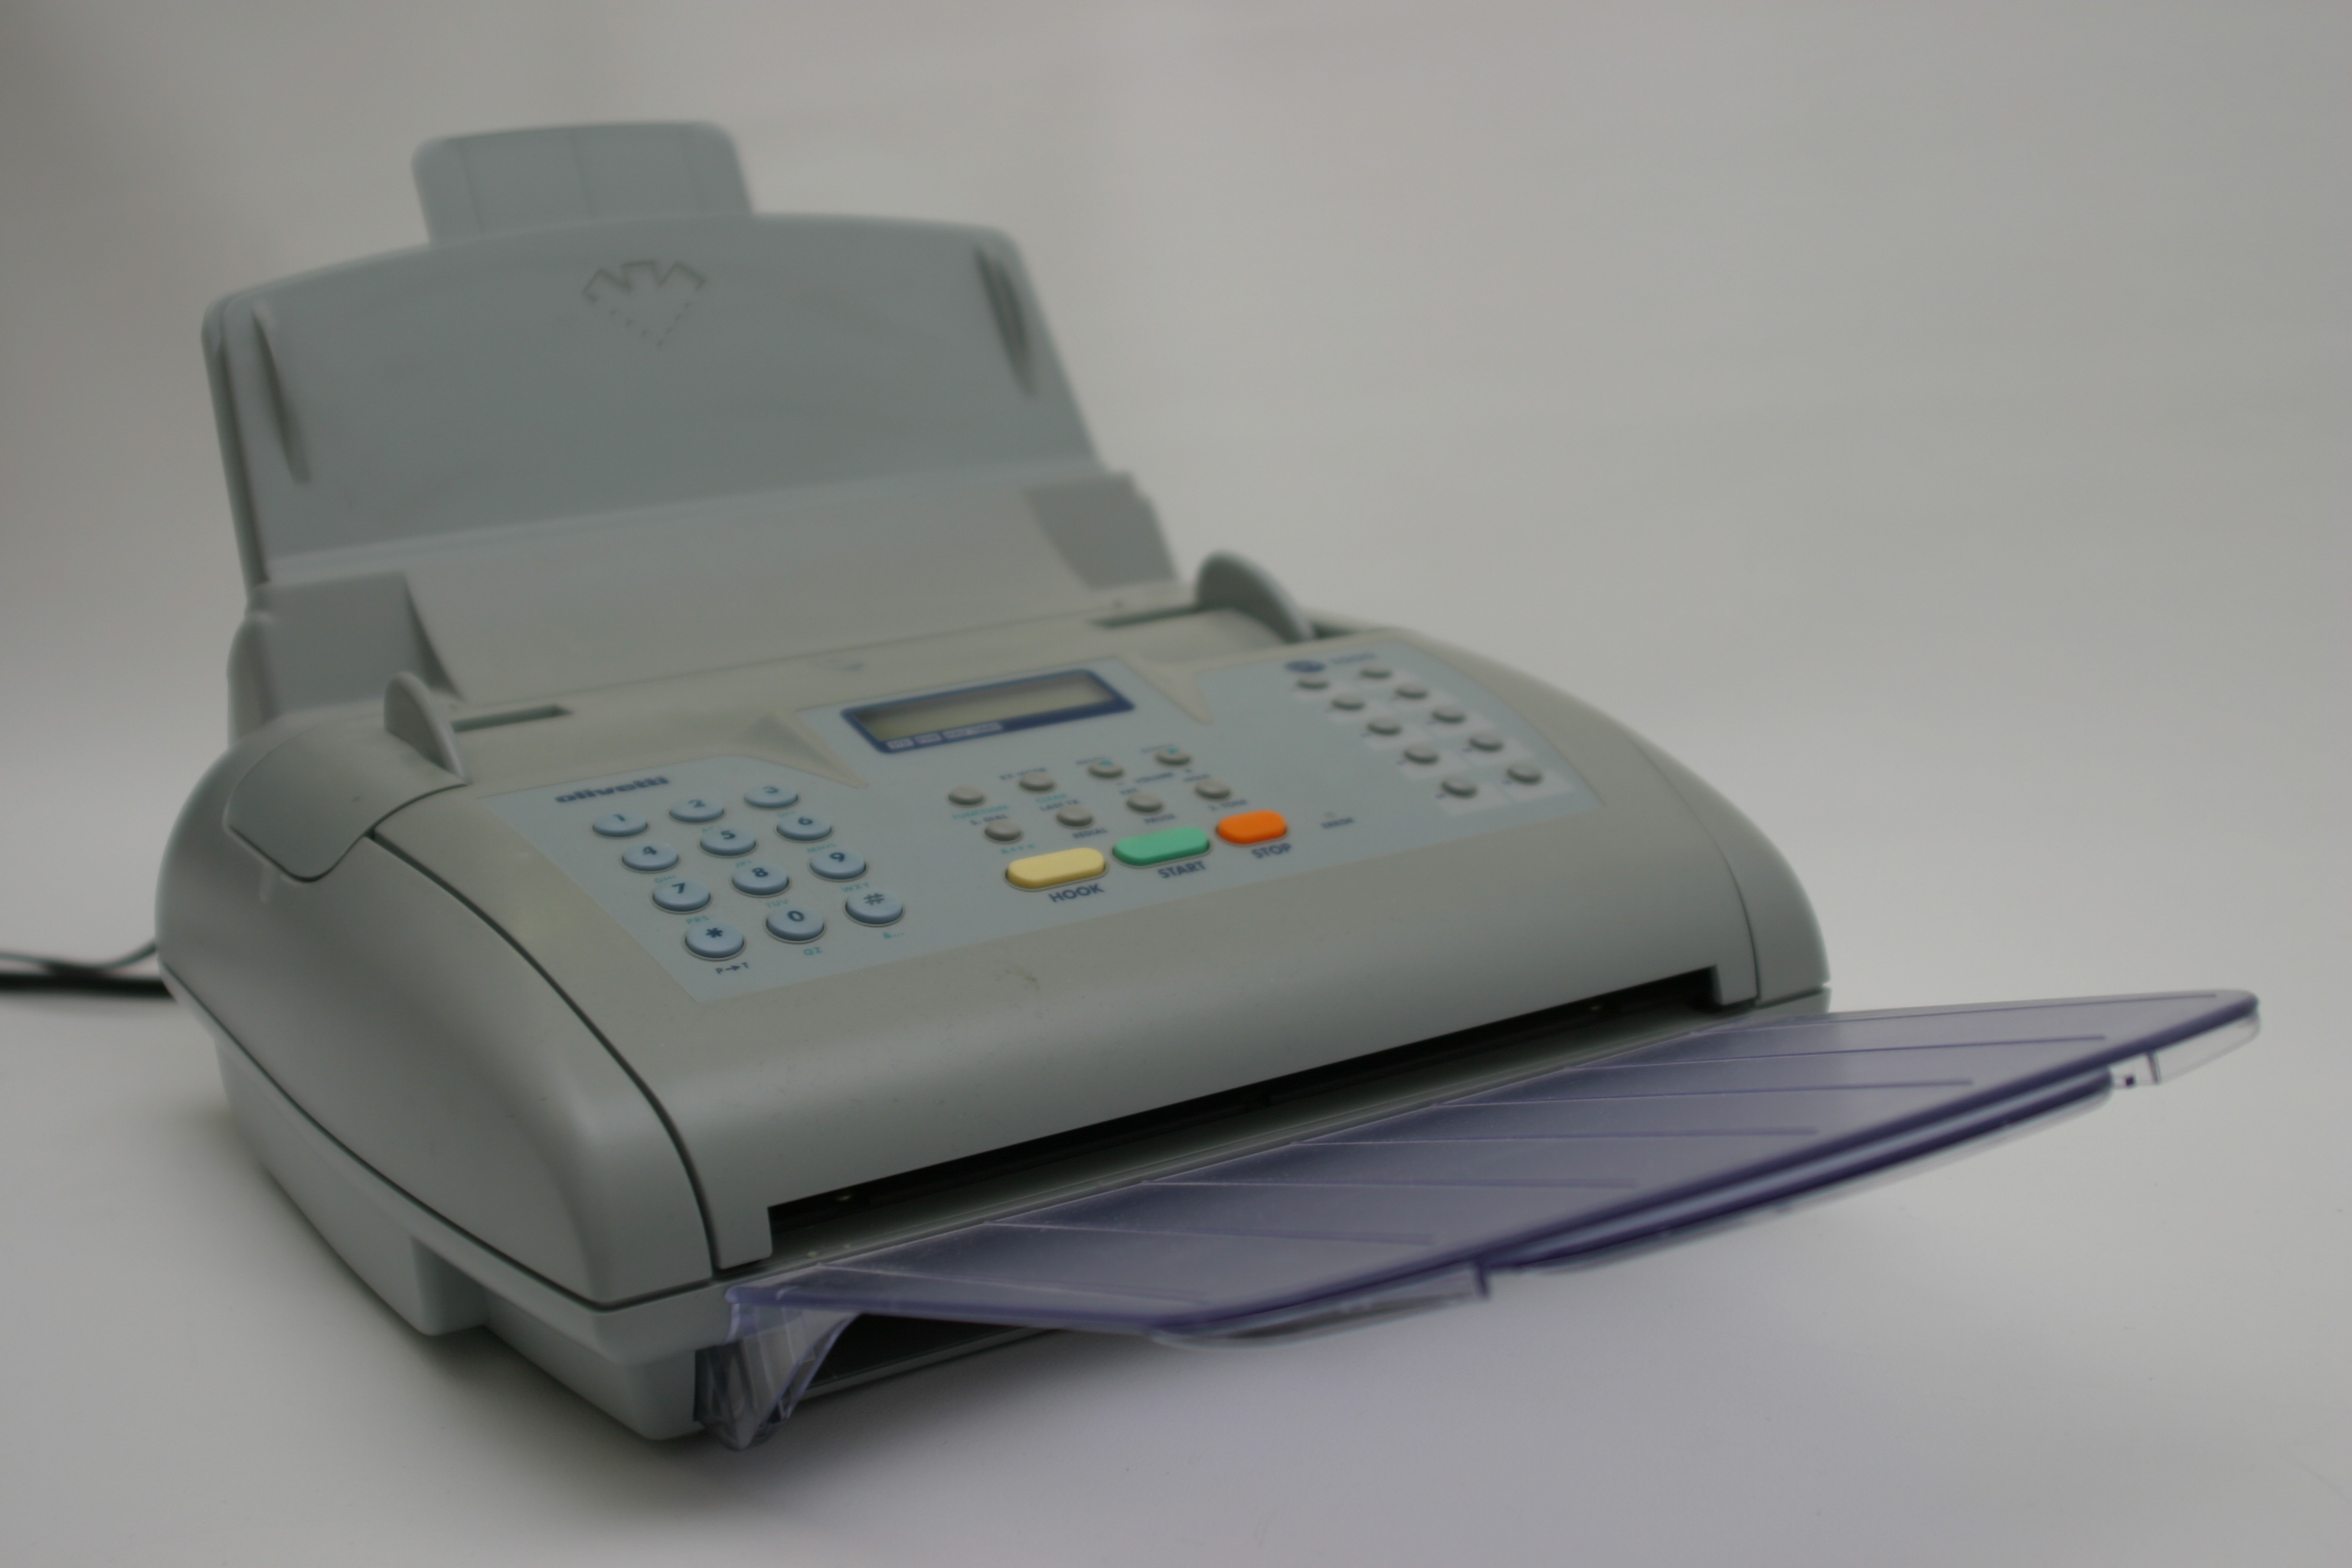 Olivetti fax machine sitting at an angle.